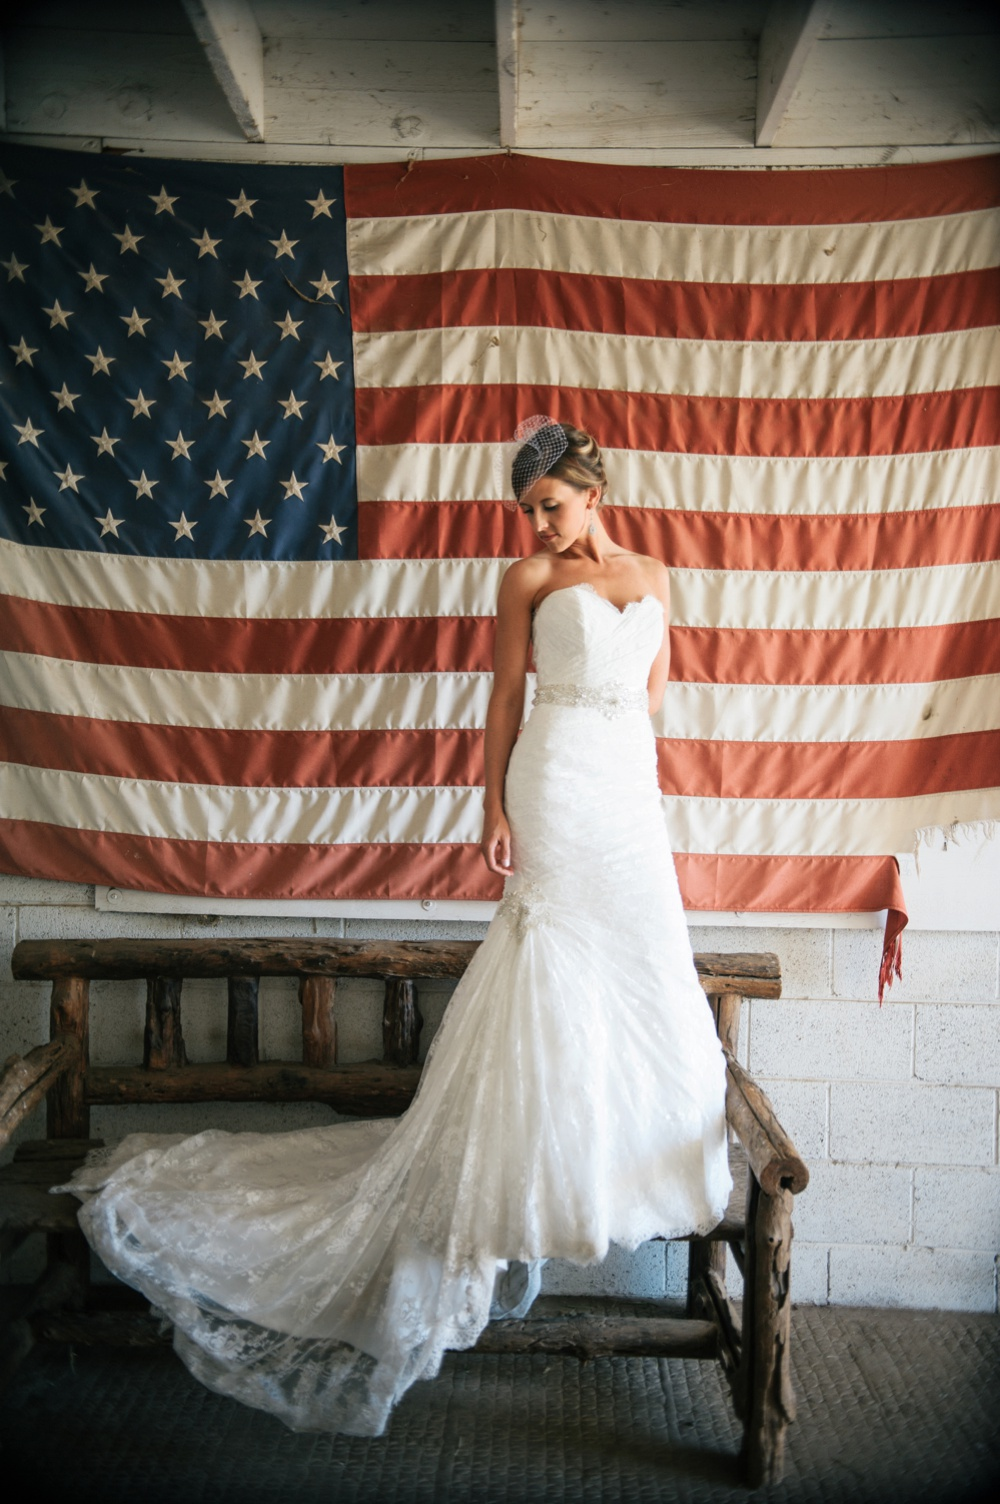 condors_nest_ranch_wedding_photographyQ.JPG